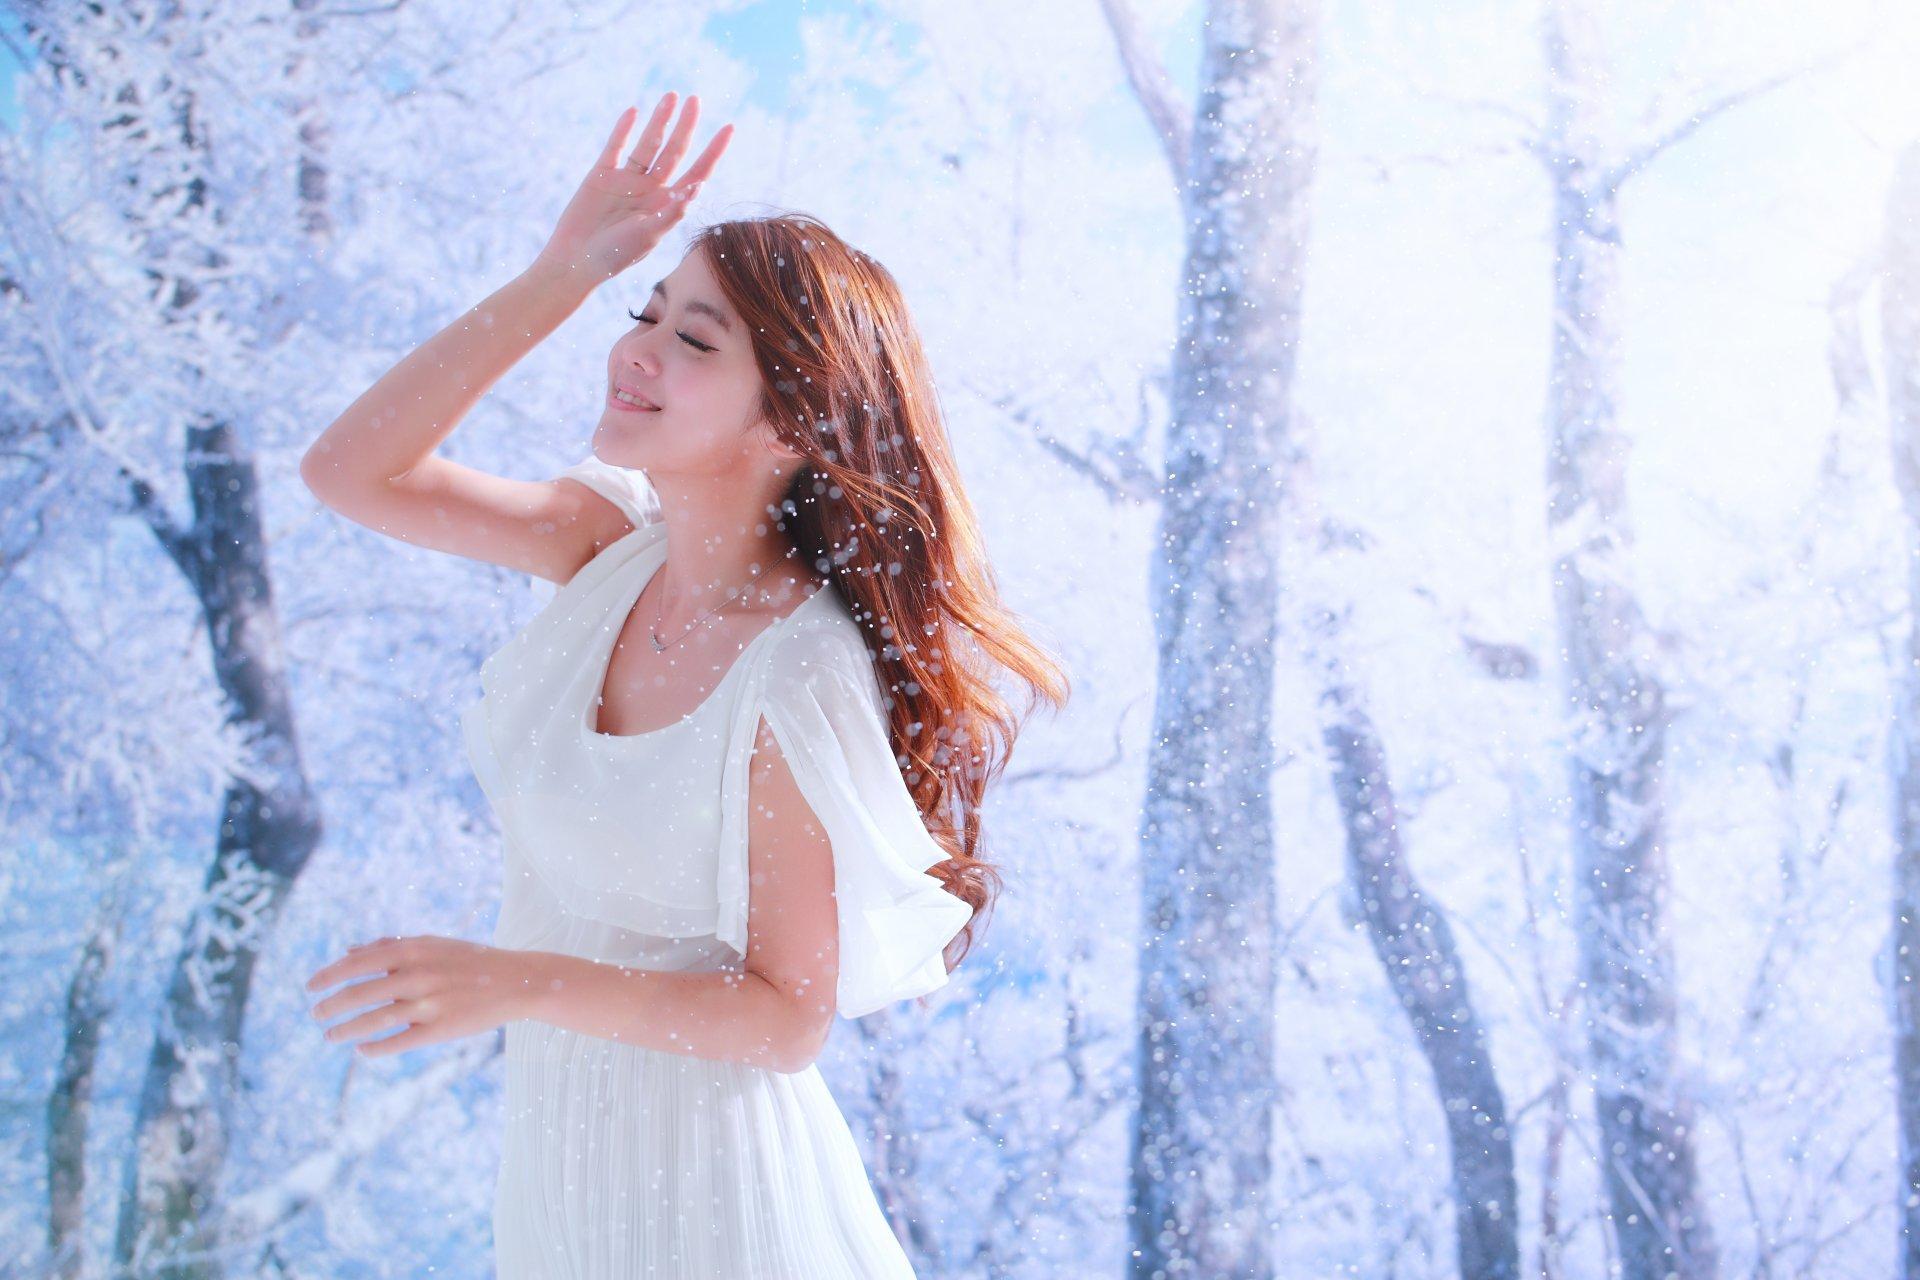 Women - Qiān Yòu  Taiwanese Girl Smile Winter Tree Dress Asian Wallpaper